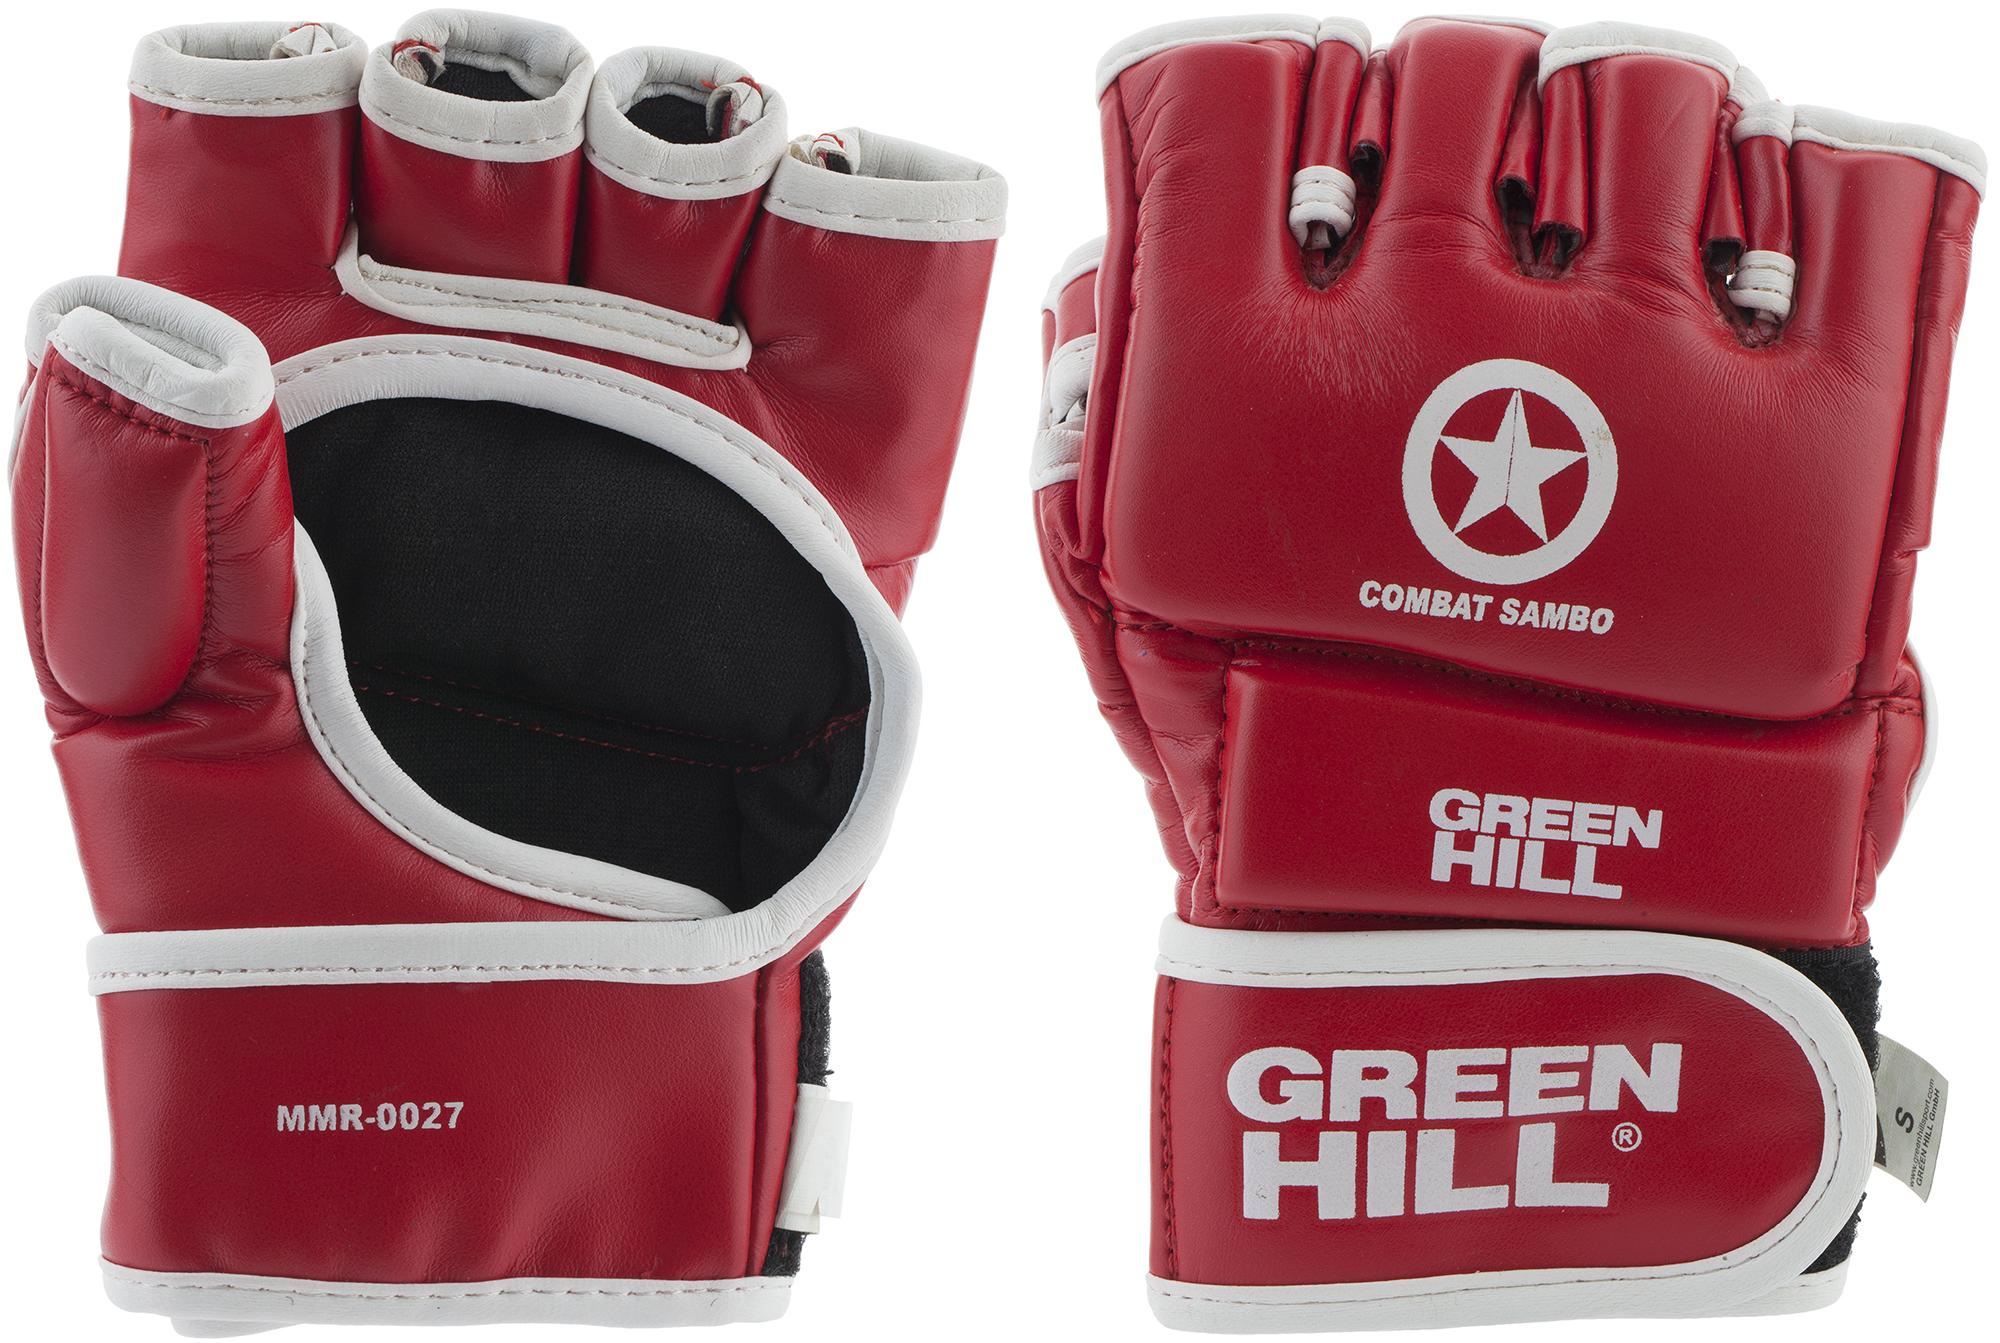 Green Hill Перчатки Green Hill Combat Sambo, размер 14 green hill перчатки green hill mma combat sambo mmc 0026cs xl кожа синие